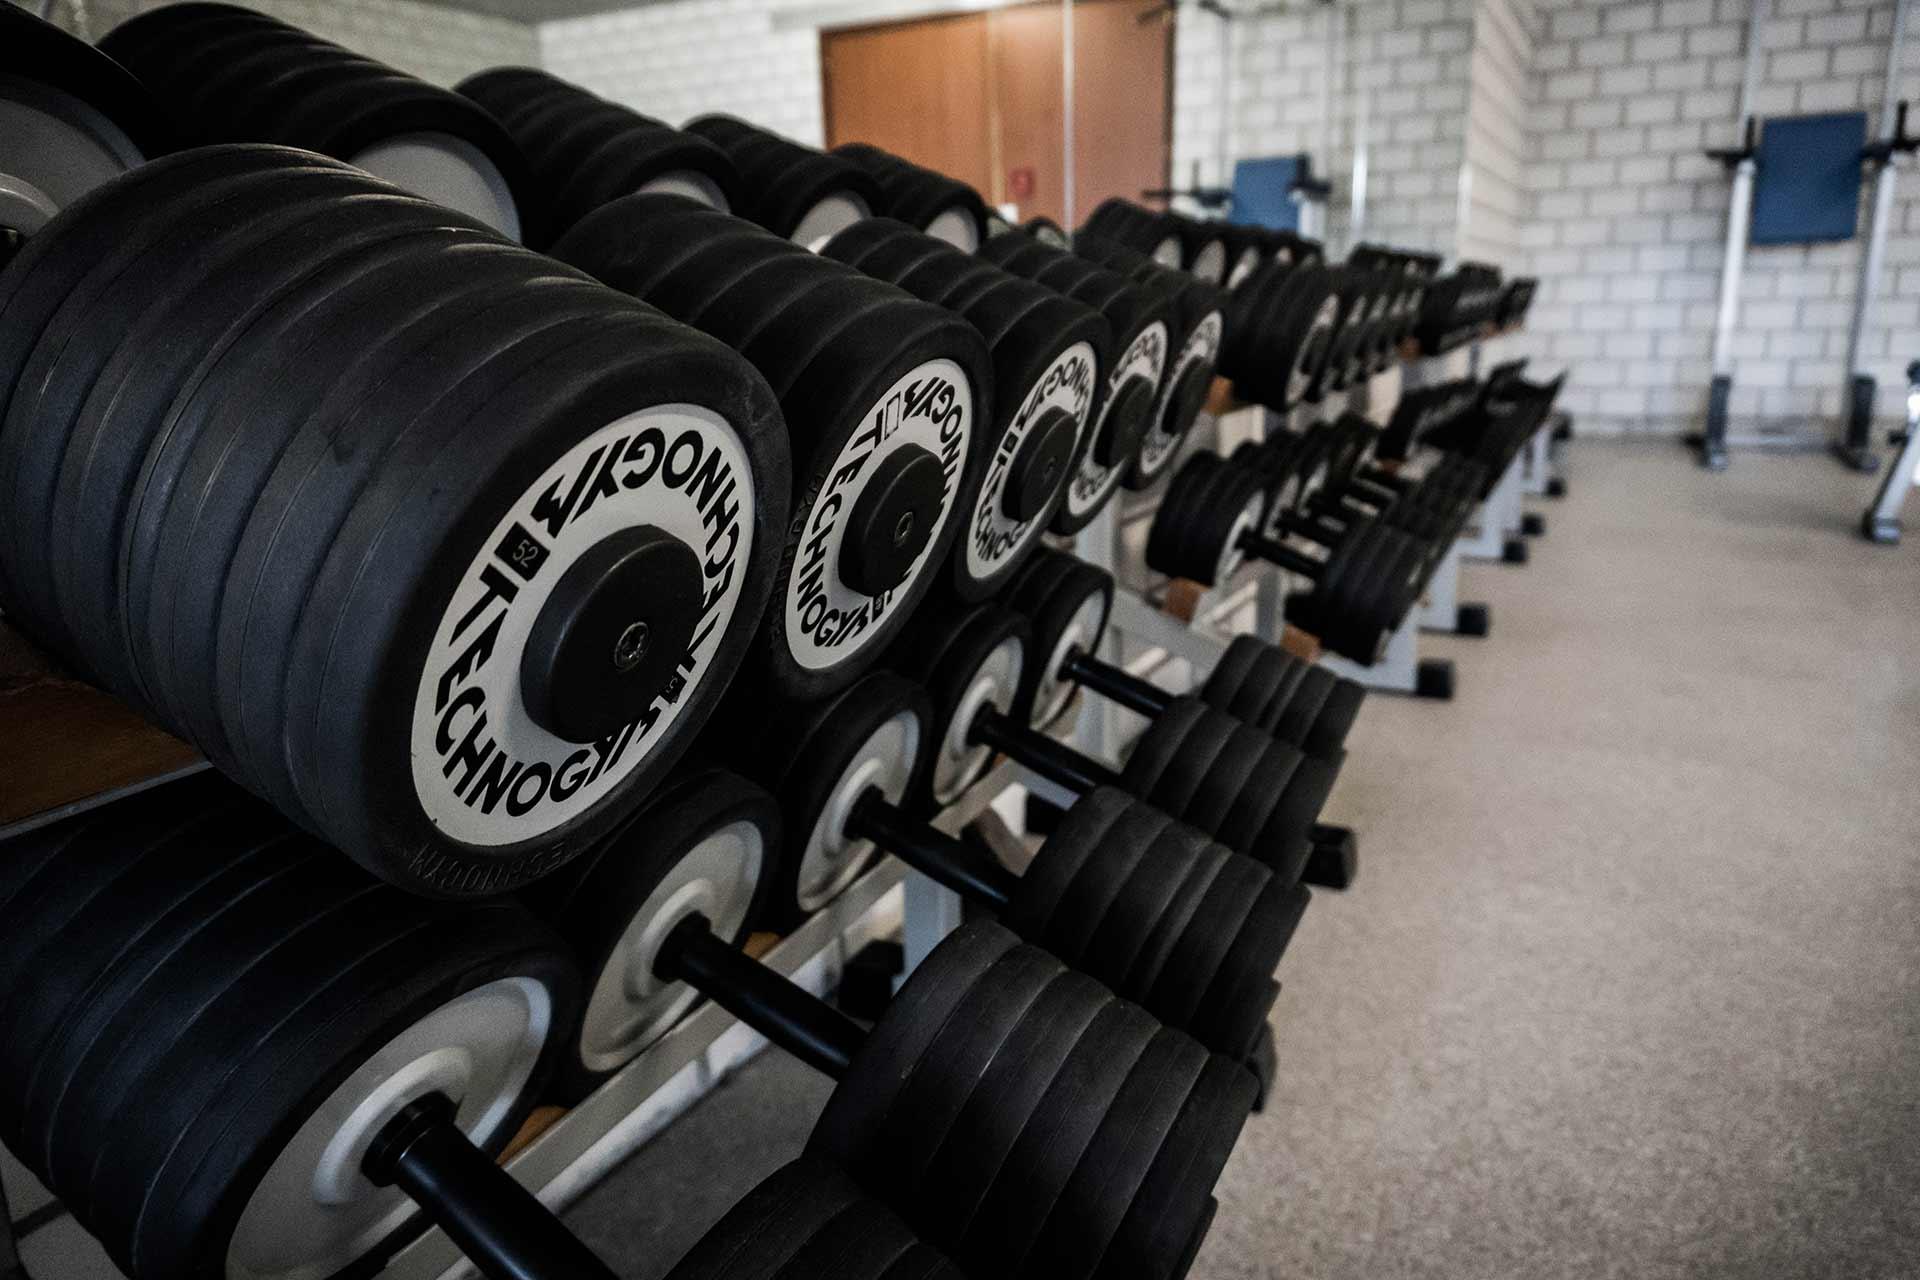 Wolfs Gym Aarberg Lyss Bern Fitness Hanteln